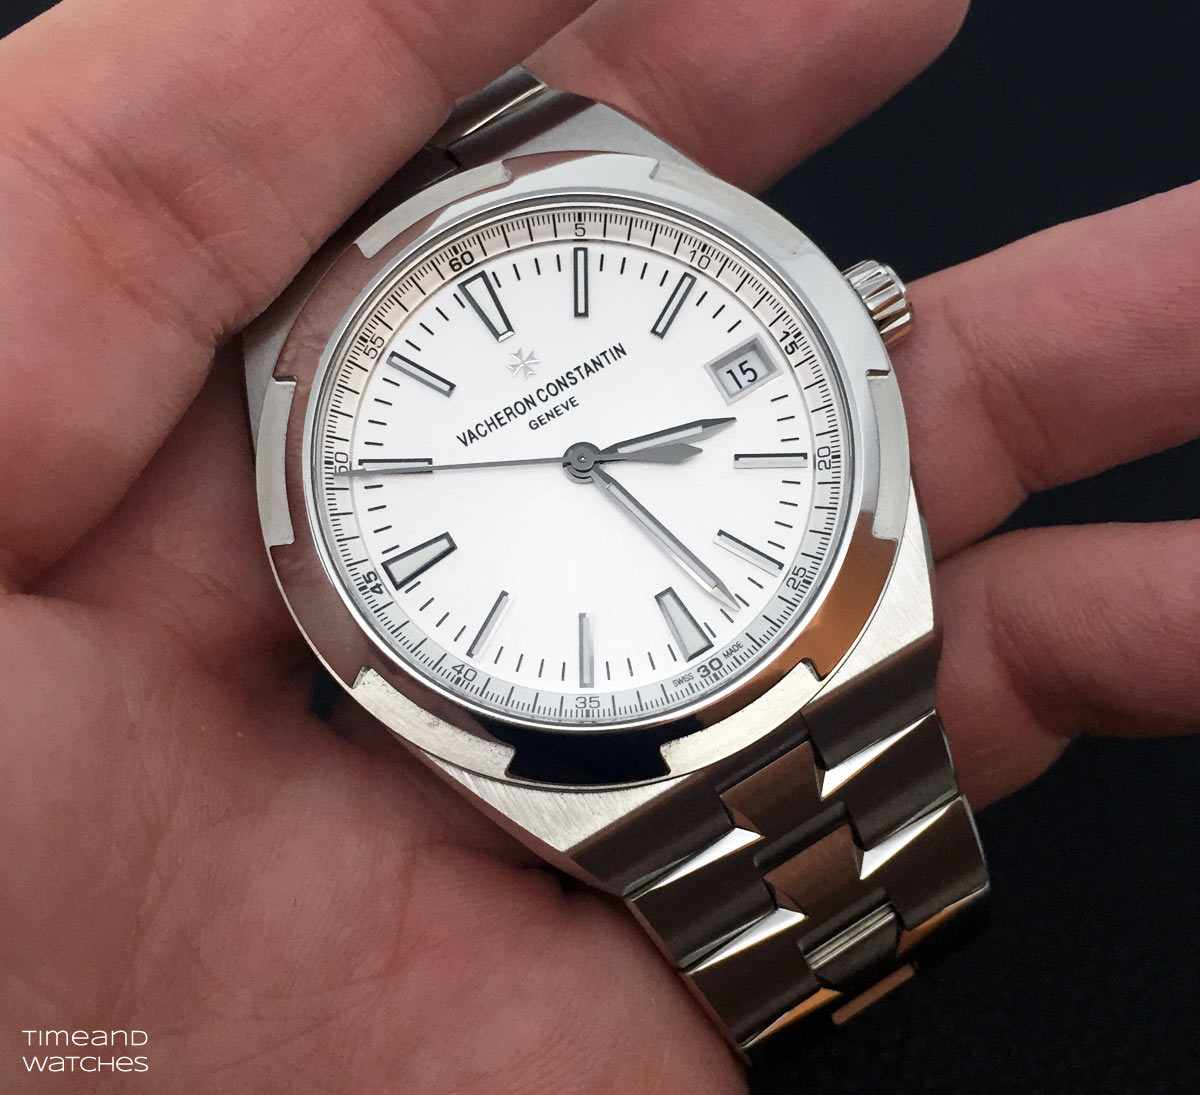 https://1.bp.blogspot.com/-I3LEi9y3WRY/VrnLJ8TiDrI/AAAAAAAARK0/K4QWl-MaoYE/s1600/Vacheron-Constantin-Overseas-4500V-wristshot2.jpg